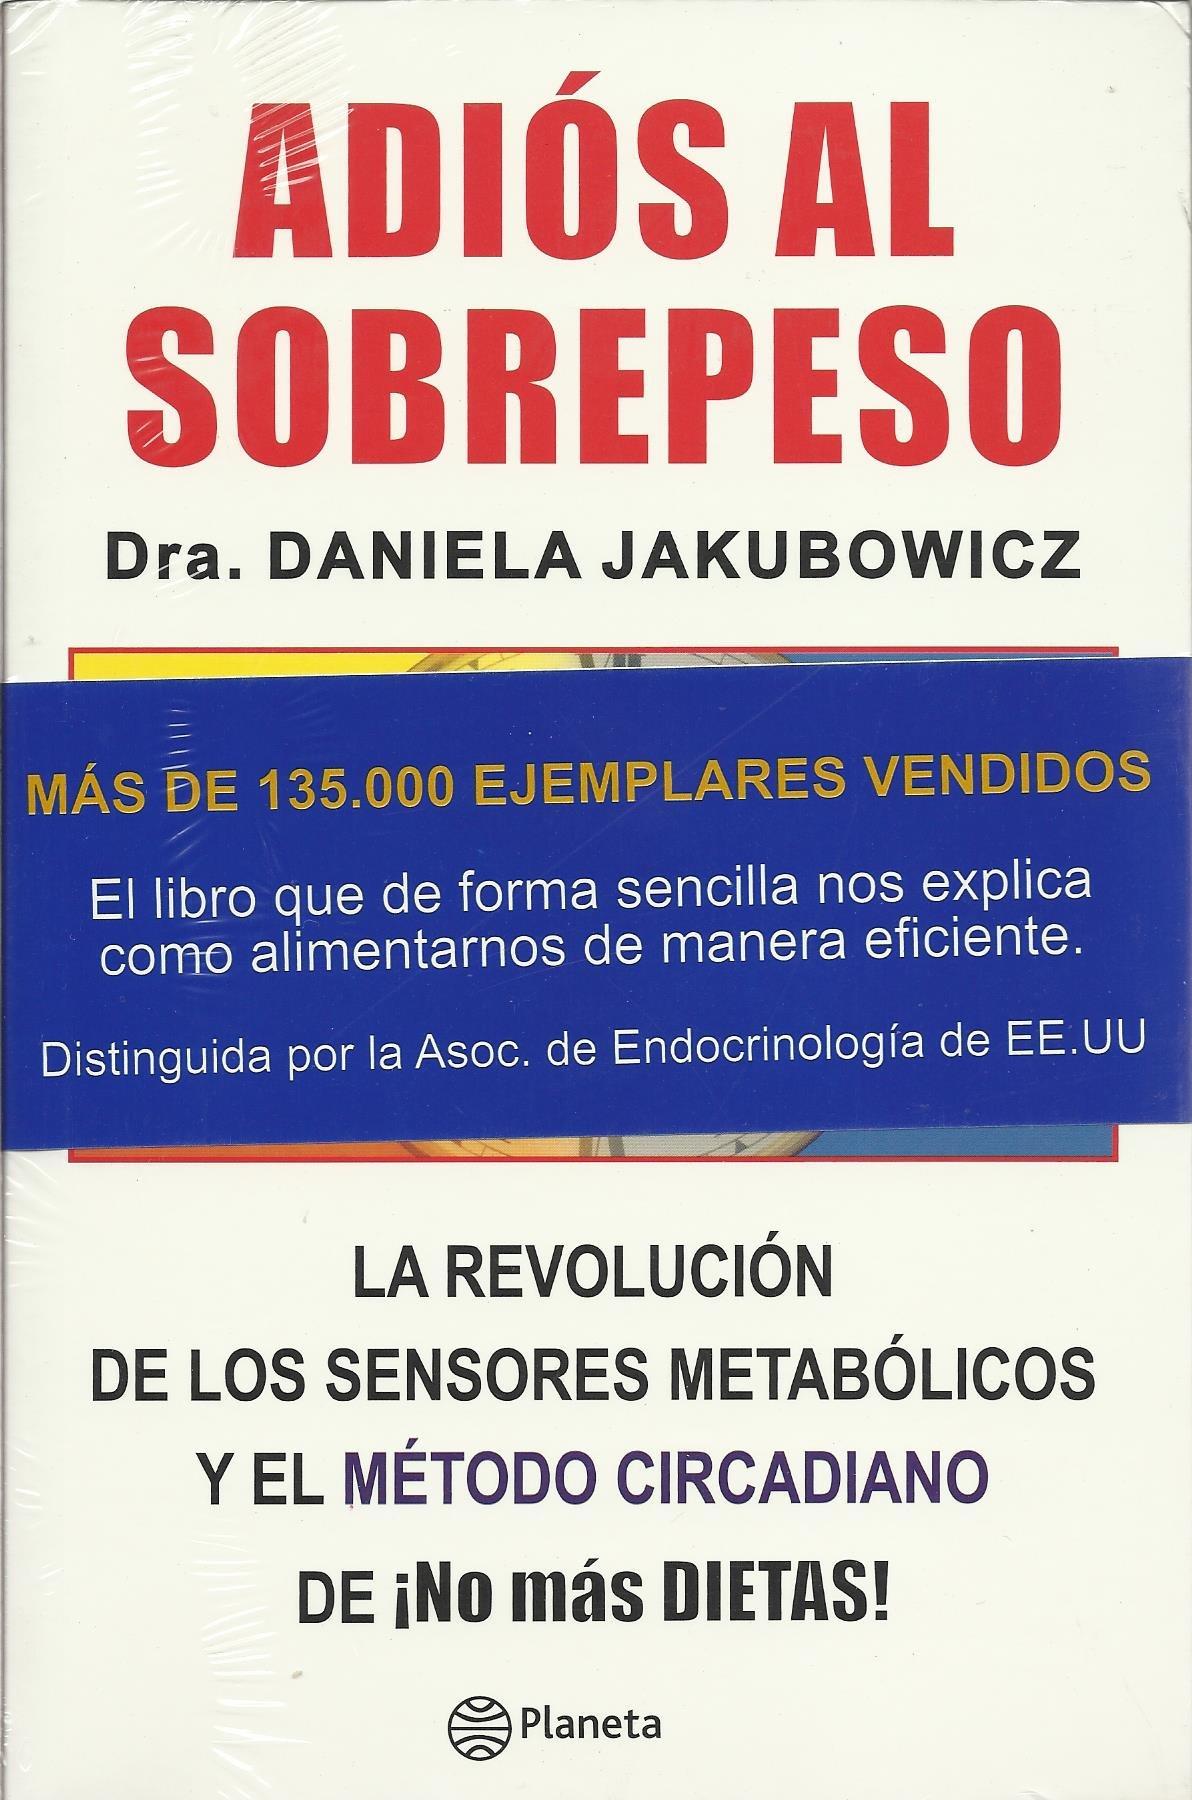 Dieta circadiana libro pdf gratis